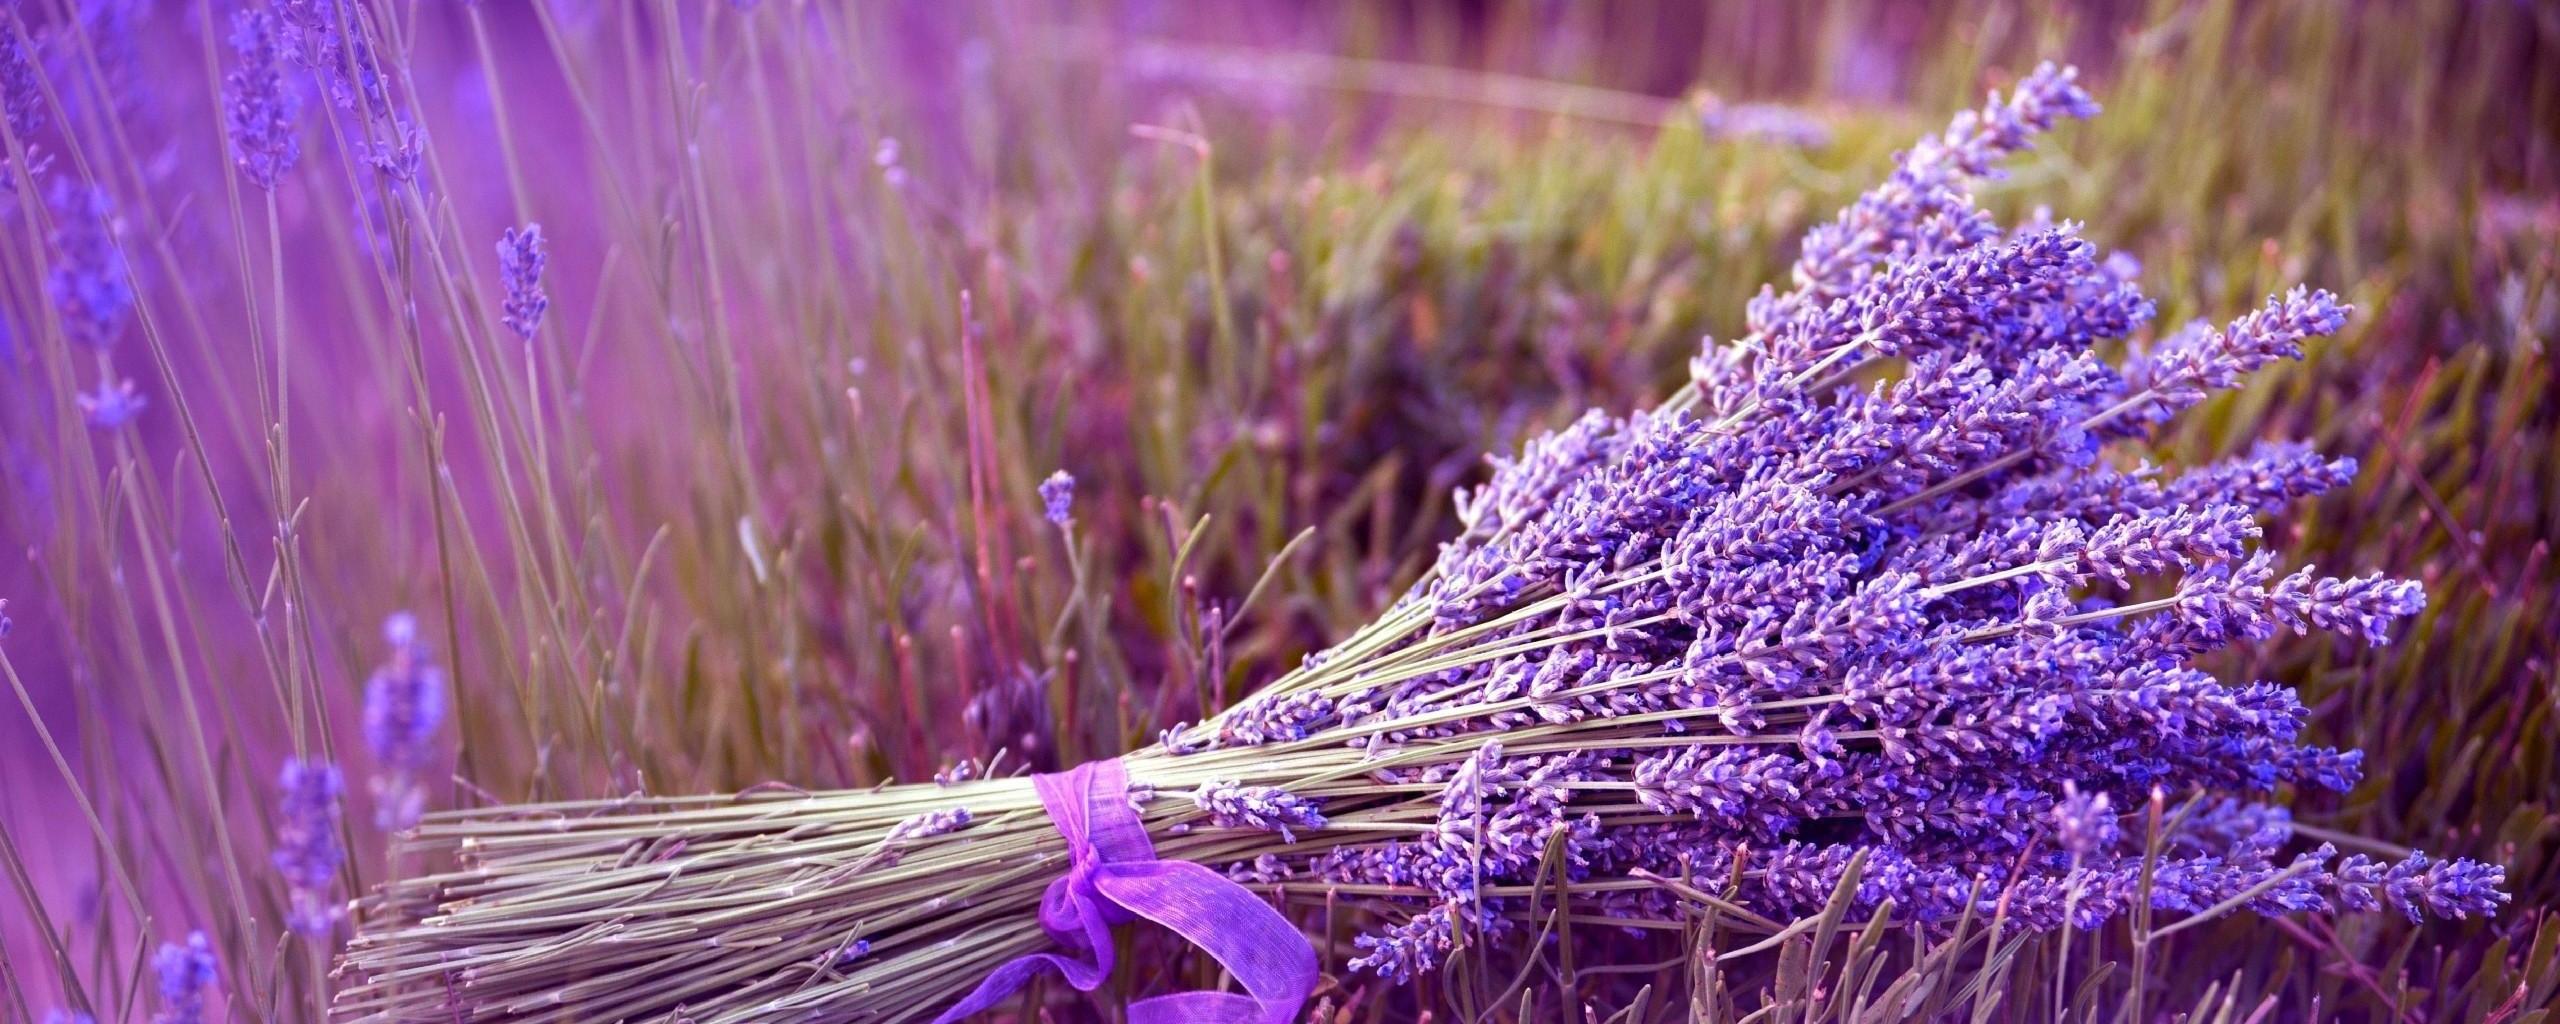 bouquet-of-lavender-HD-wallpaper